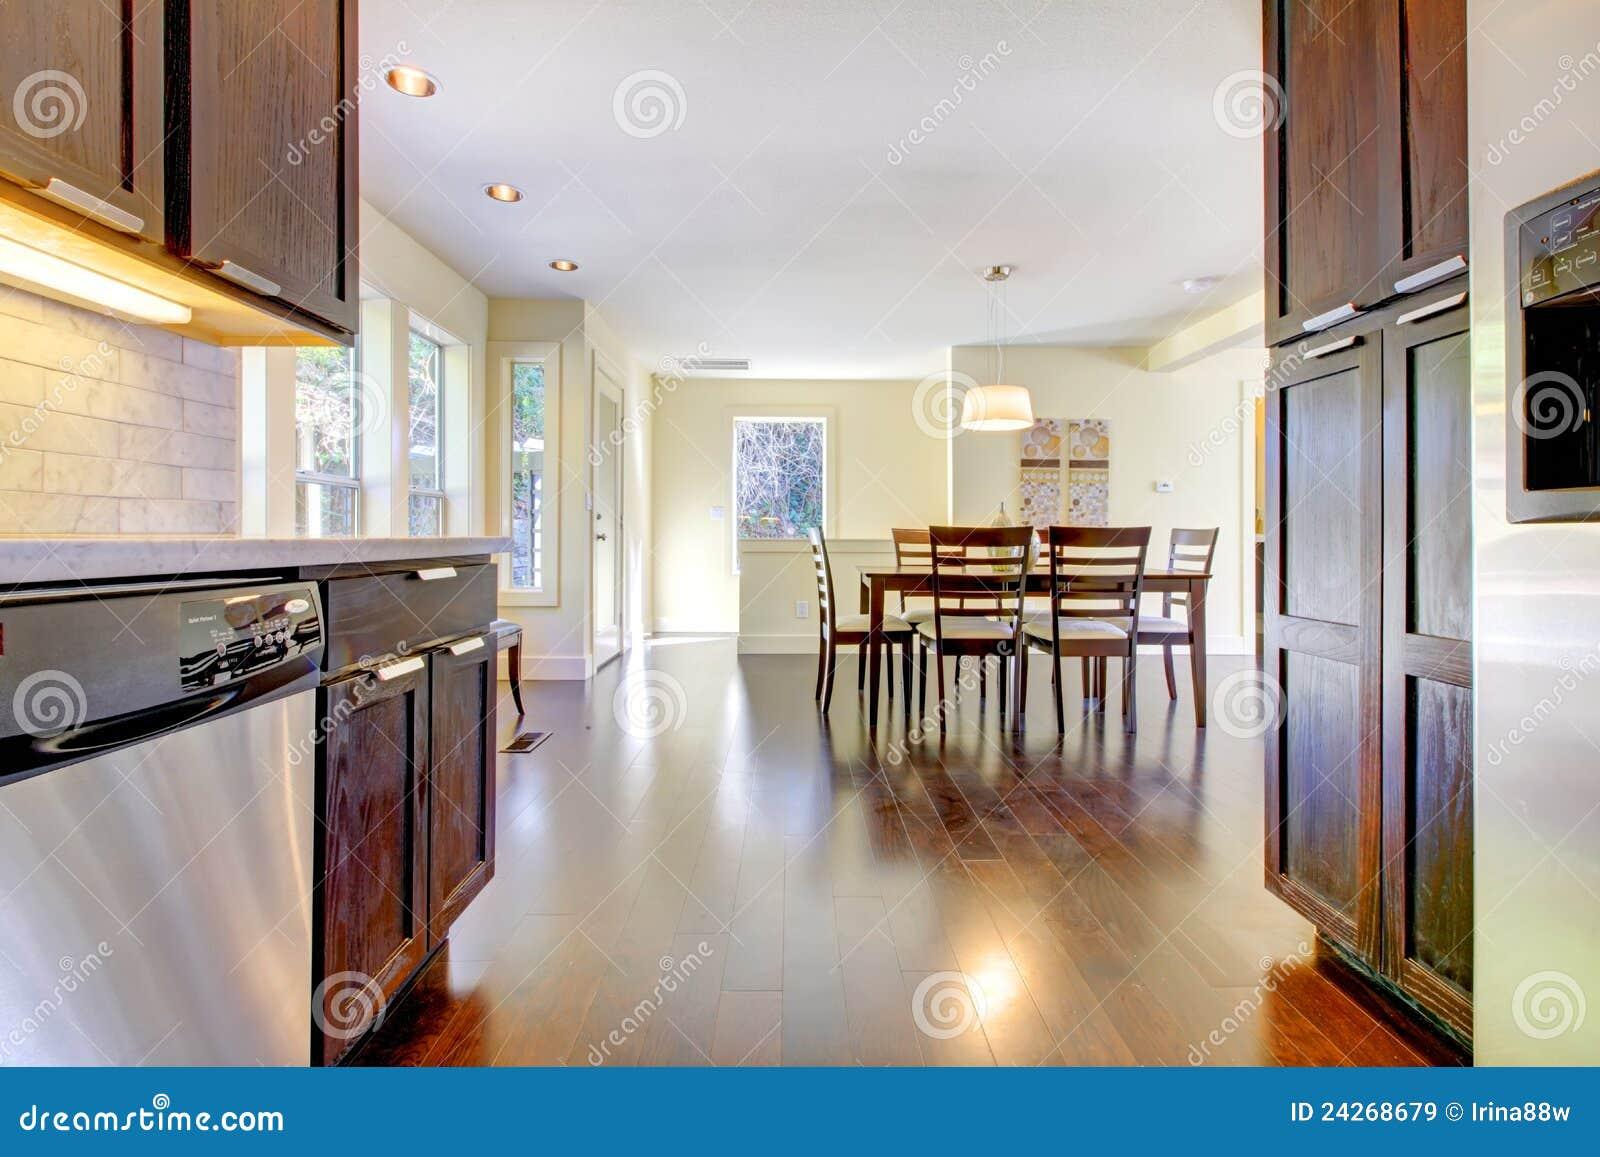 Sala da pranzo e cucina nella casa moderna luminosa - Stanze da pranzo moderne ...